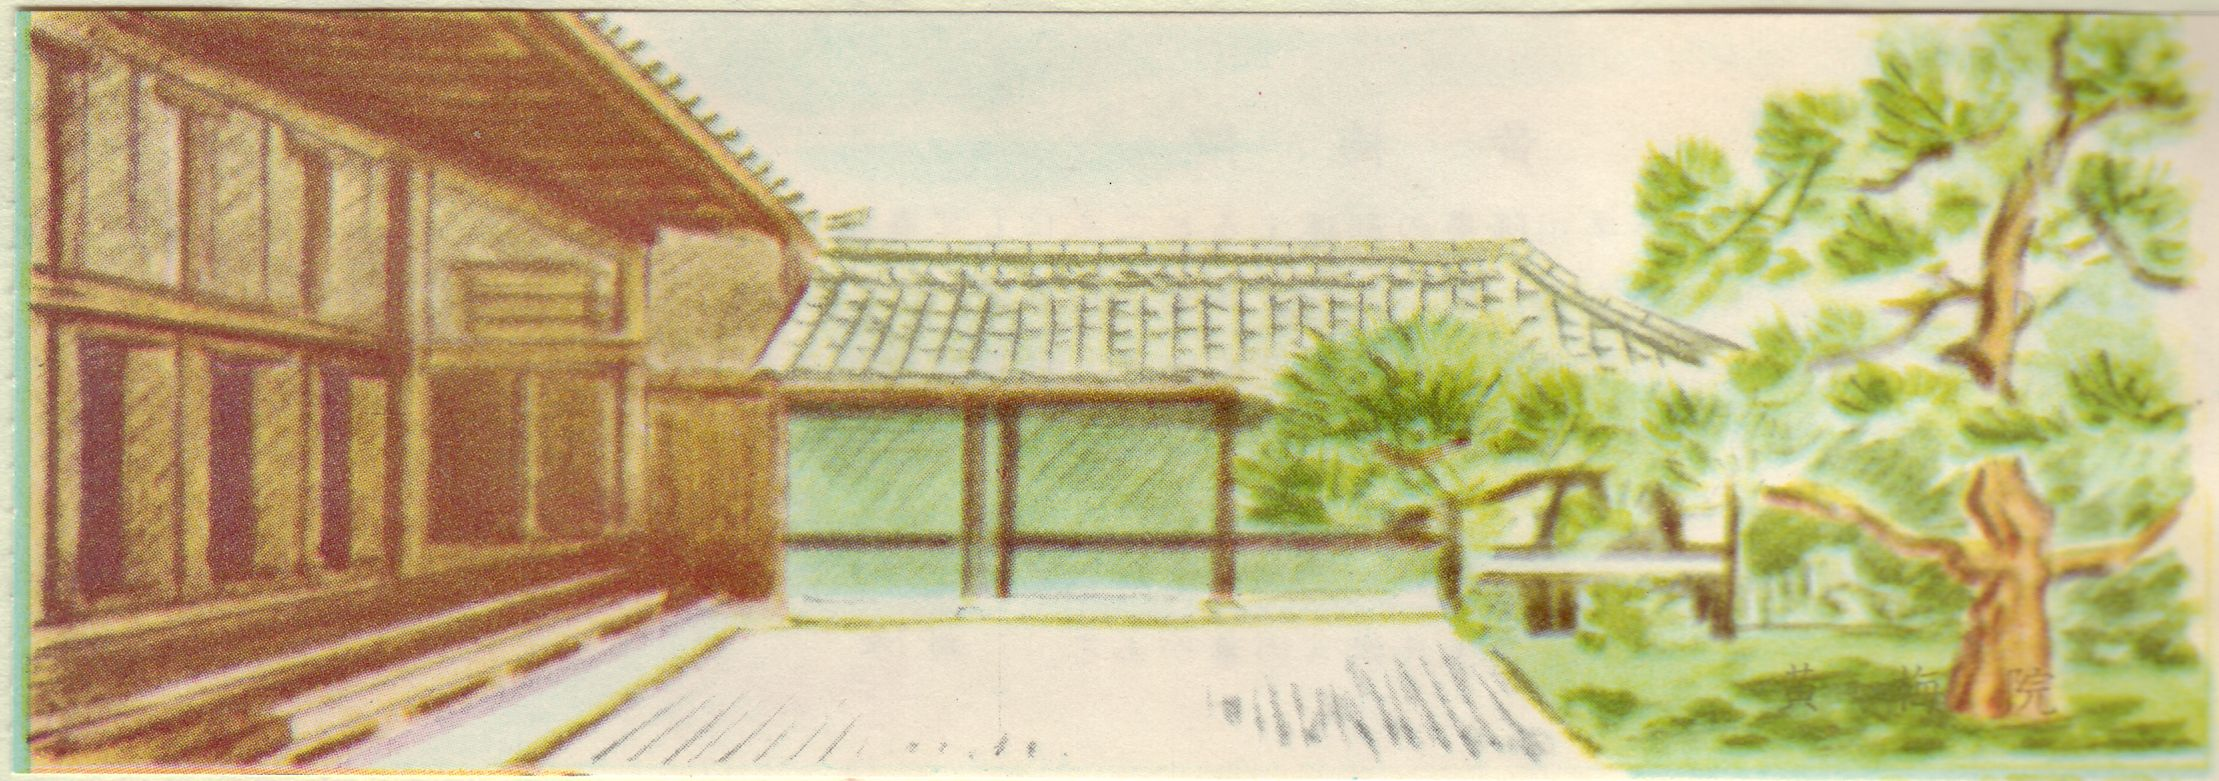 大徳寺黄梅院の拝観券